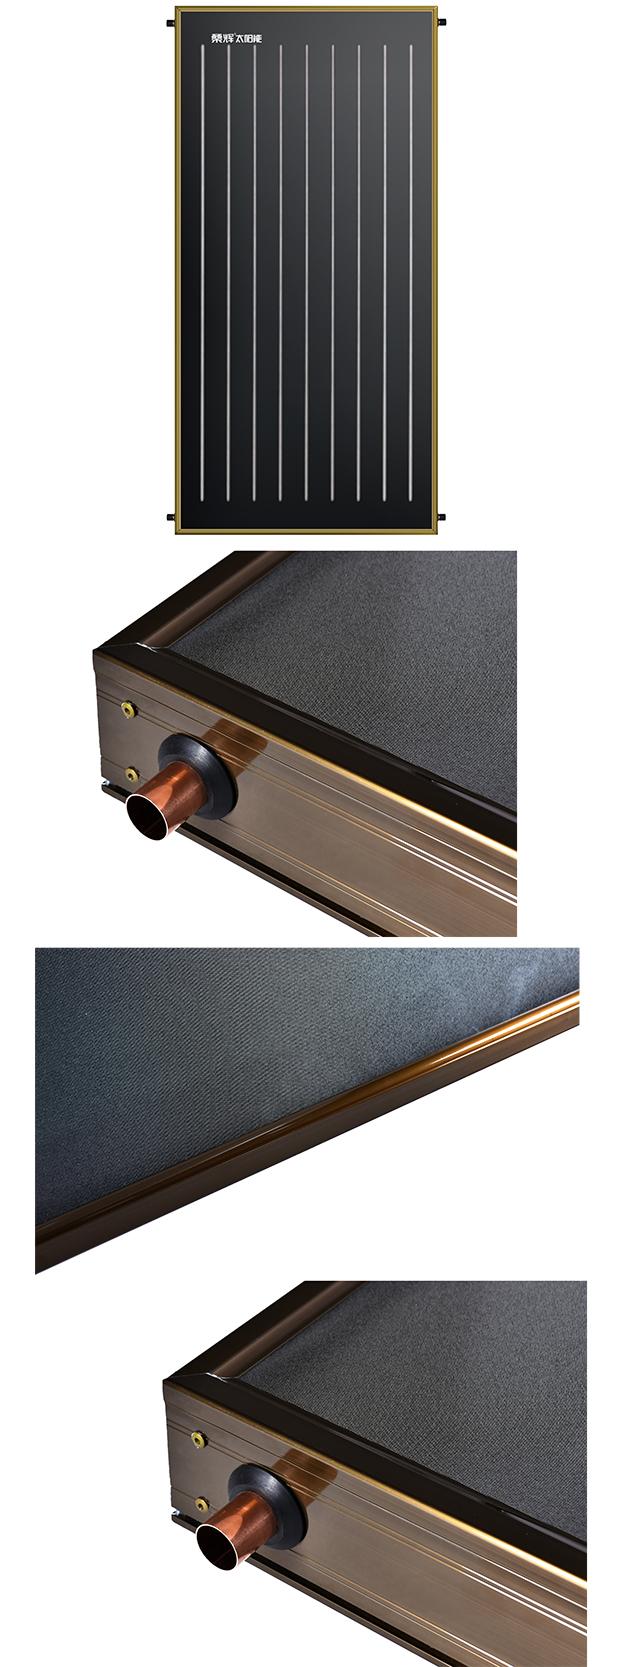 SHe-AO 80L 120L 150L 300L Solar Hot Flate Plate Home Business Using Watre Heater China Manufacturer